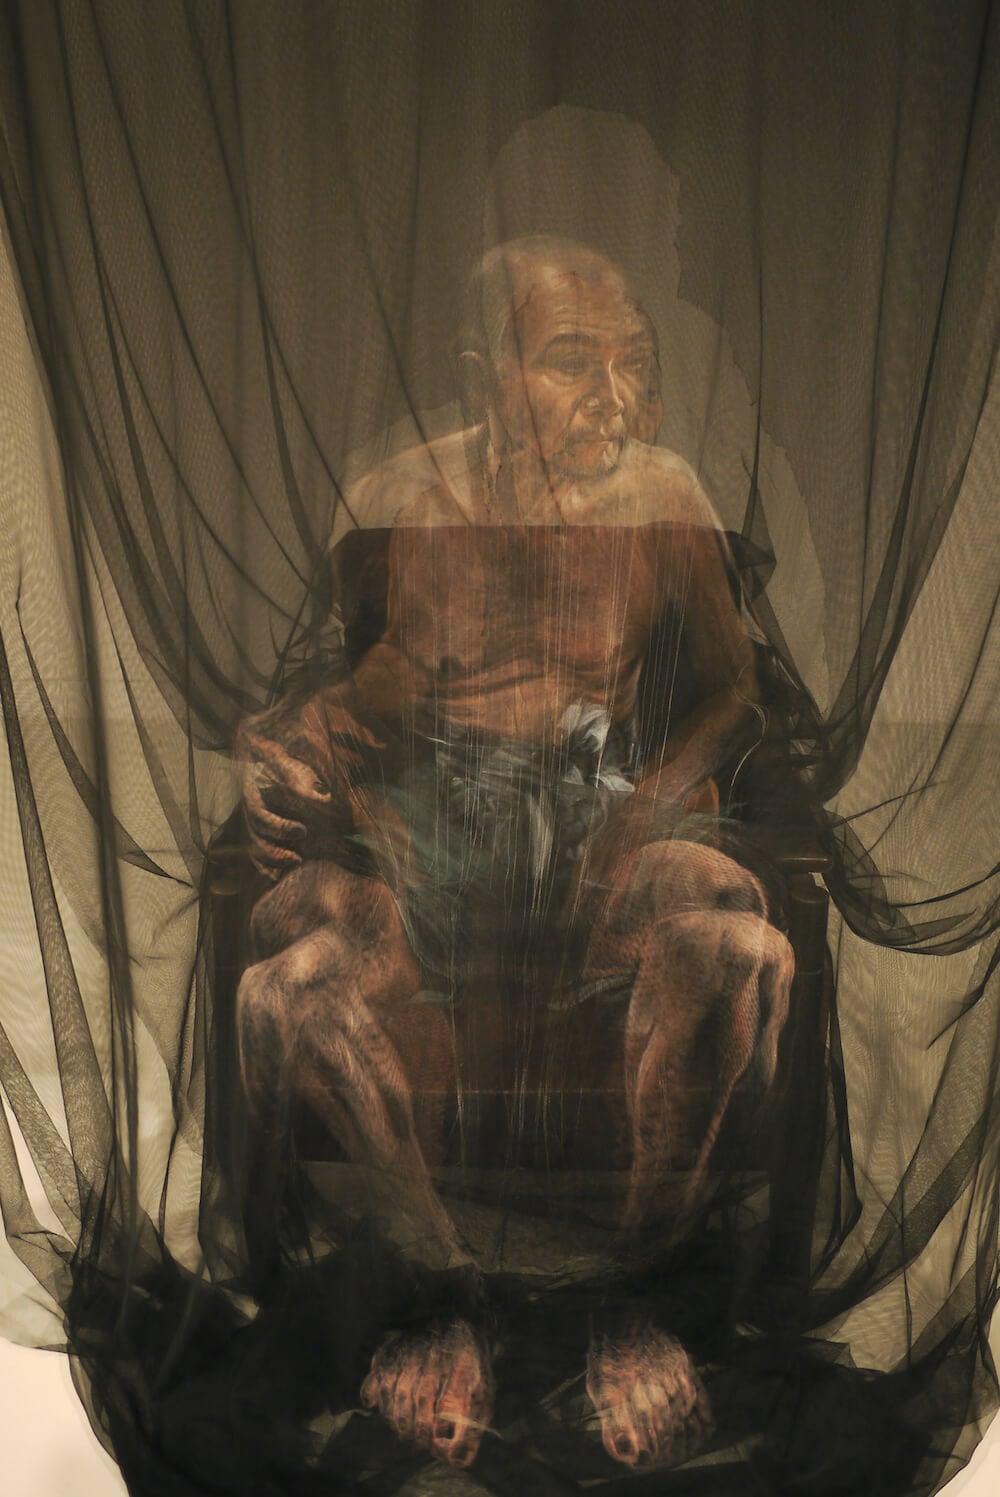 ghostly-portraits-uttaporn-nimmalaikaew-fy-4